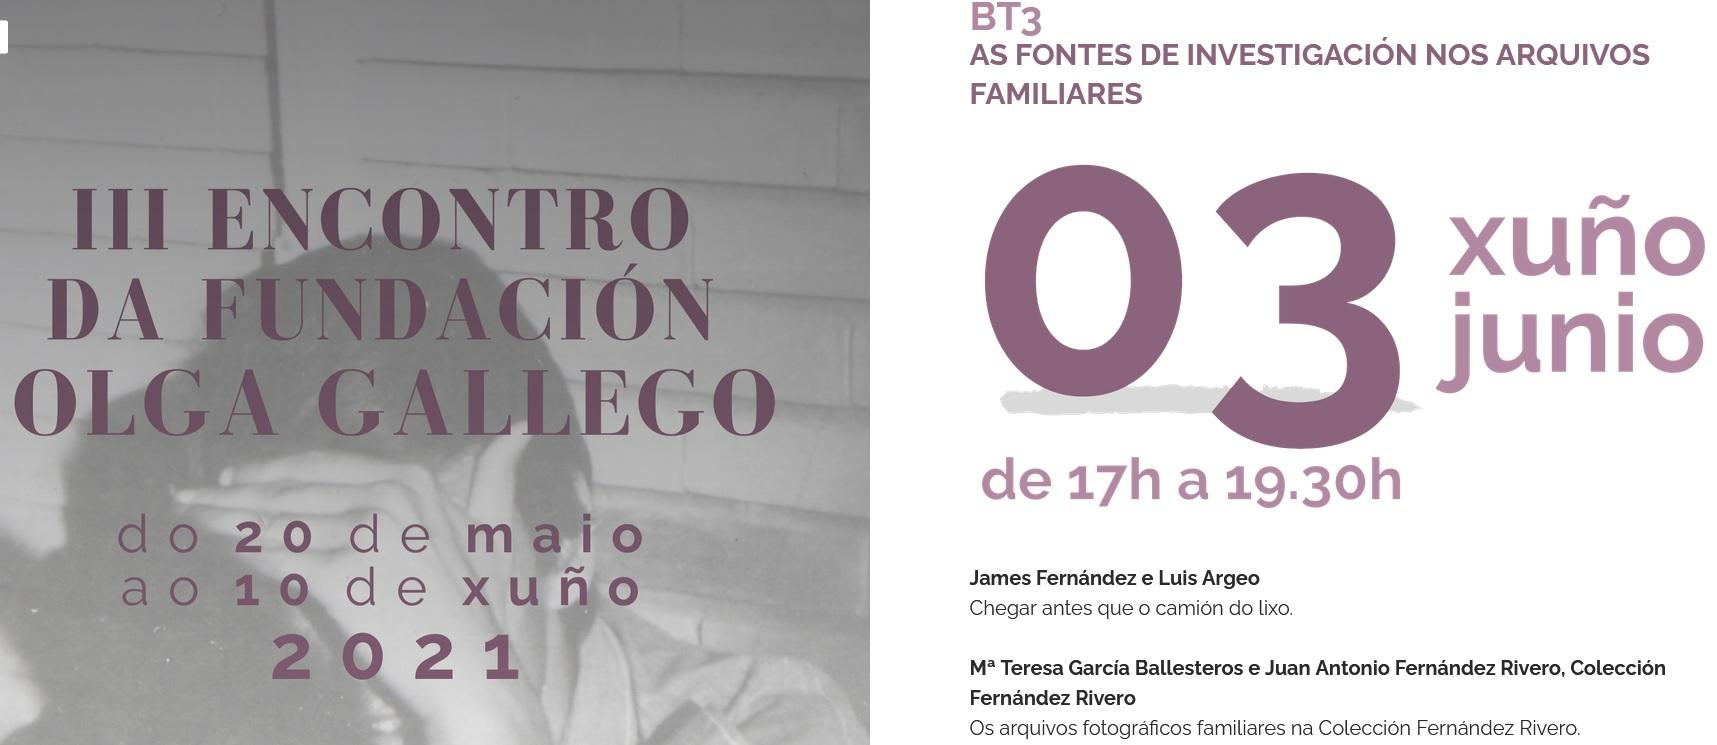 III Encontro fundacion Olga Gallego